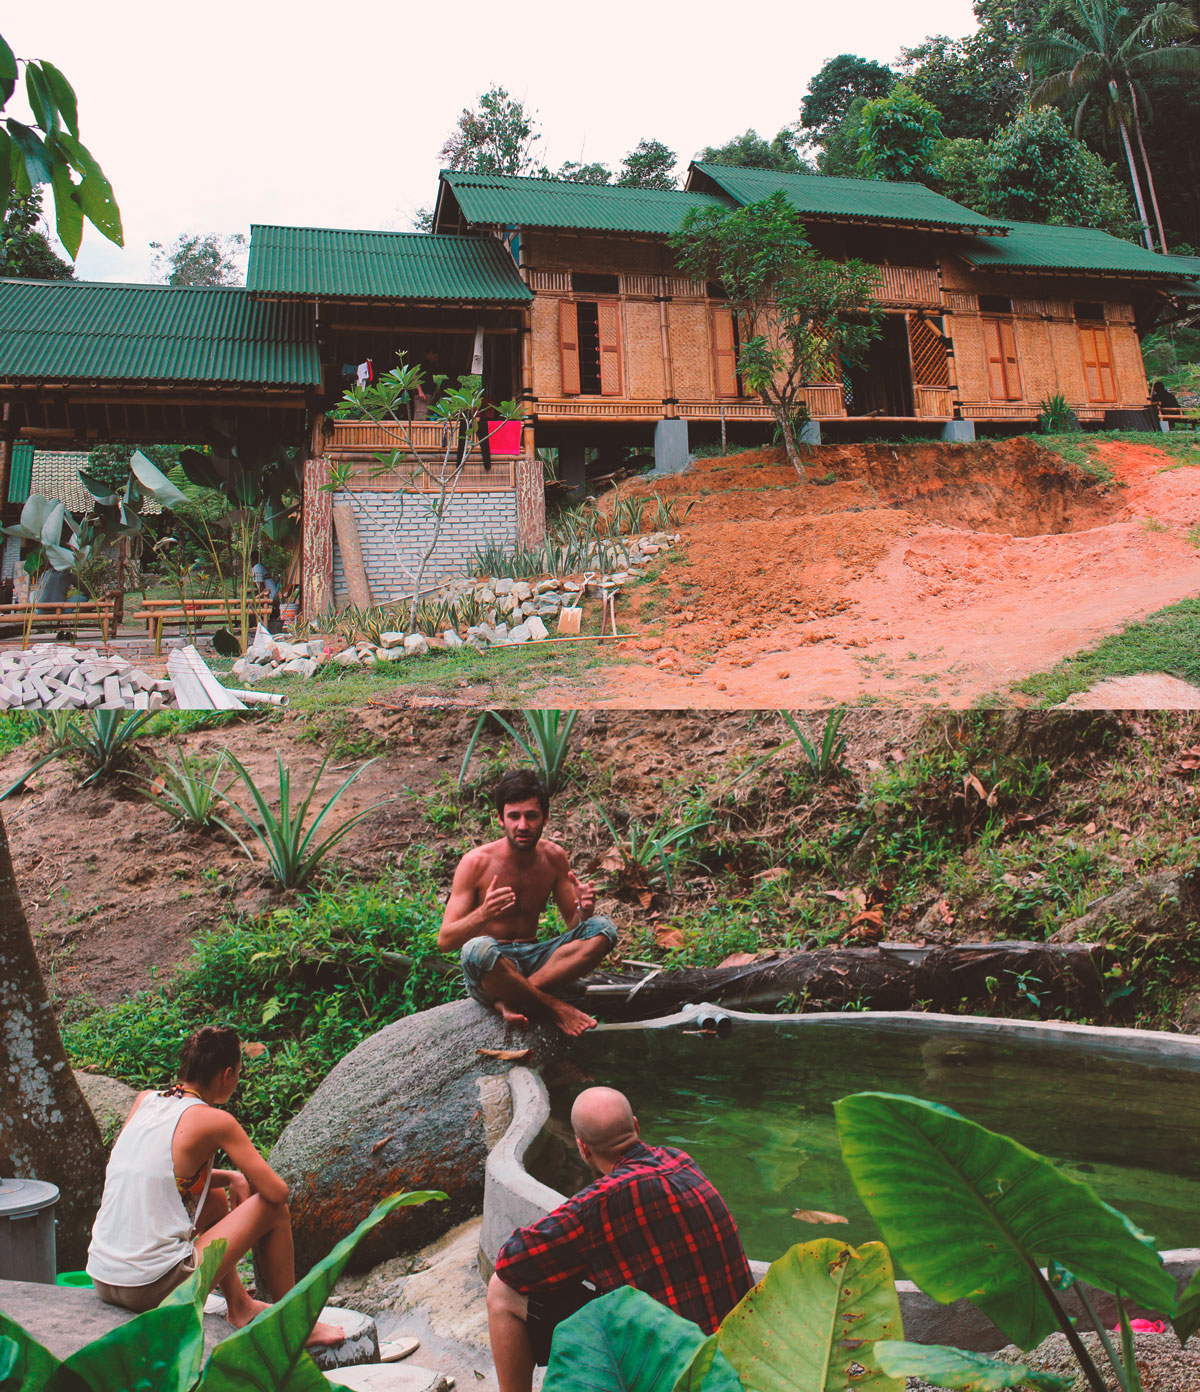 Bamboo village impressionen 3